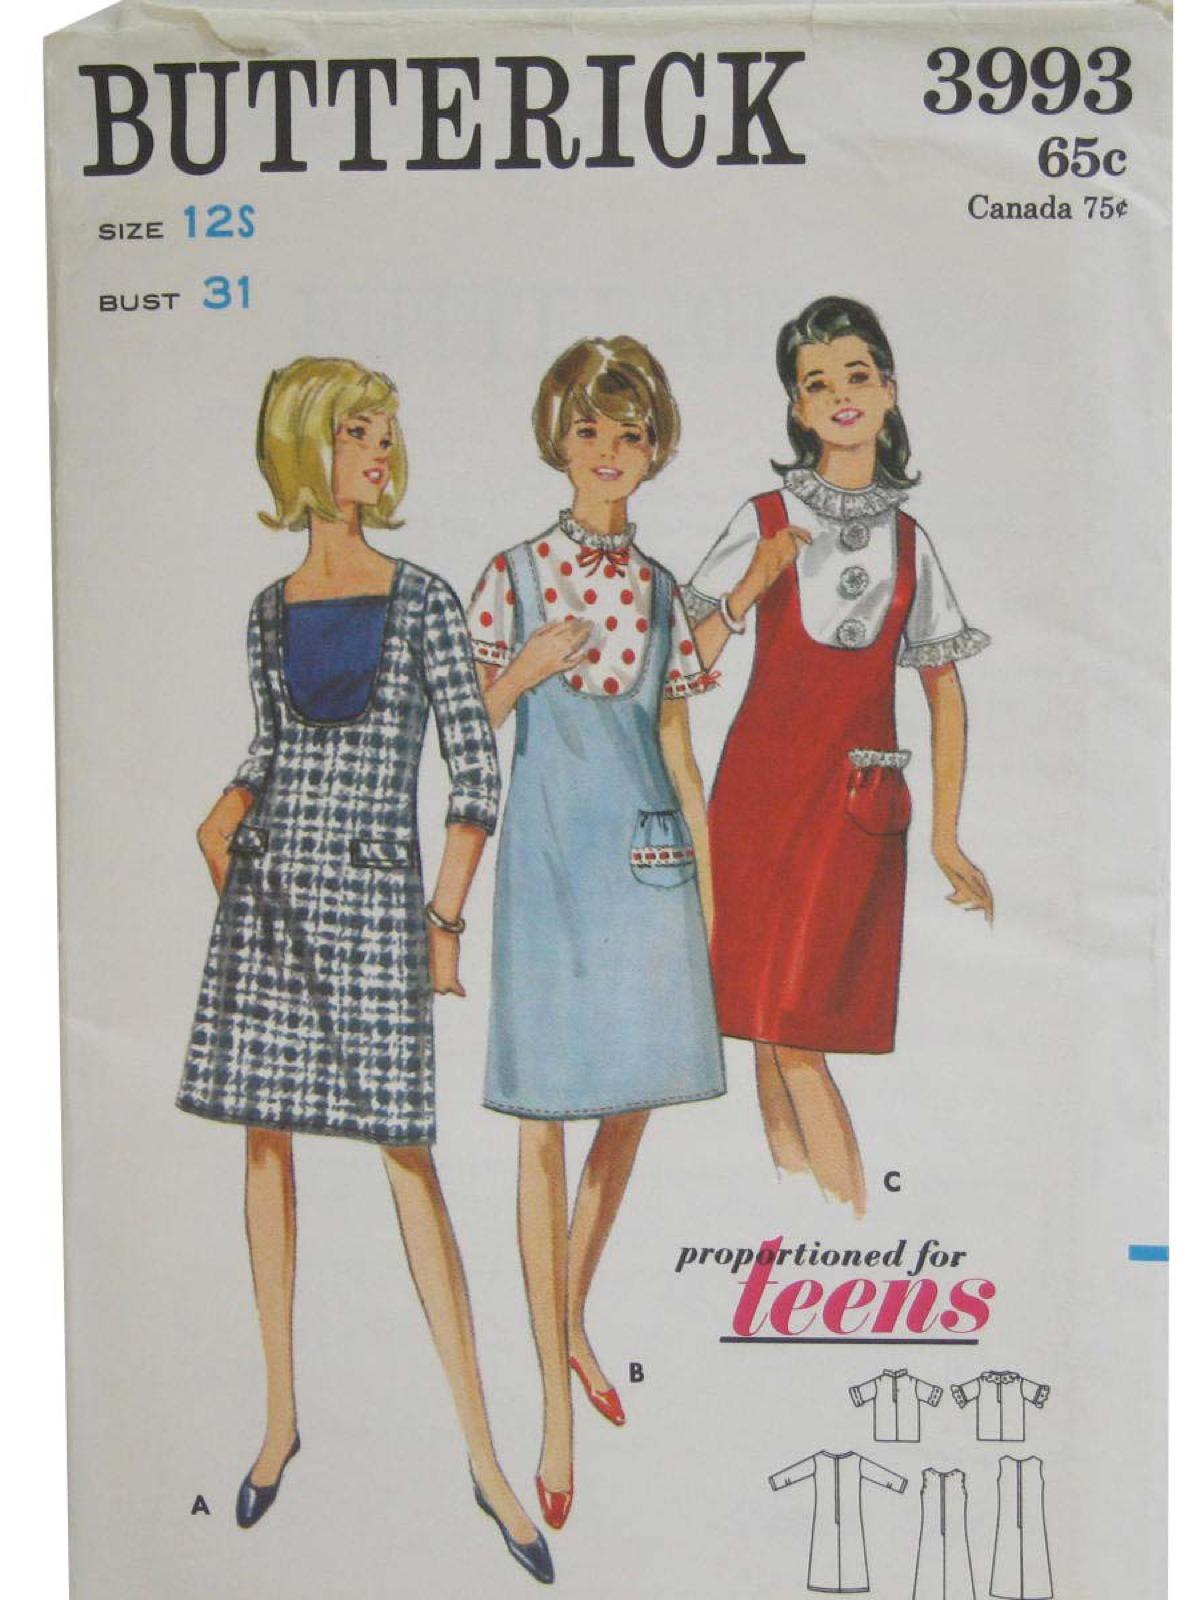 da4650adce44 1960 s Vintage Butterick Pattern No. 3993 Sewing Pattern  60s ...